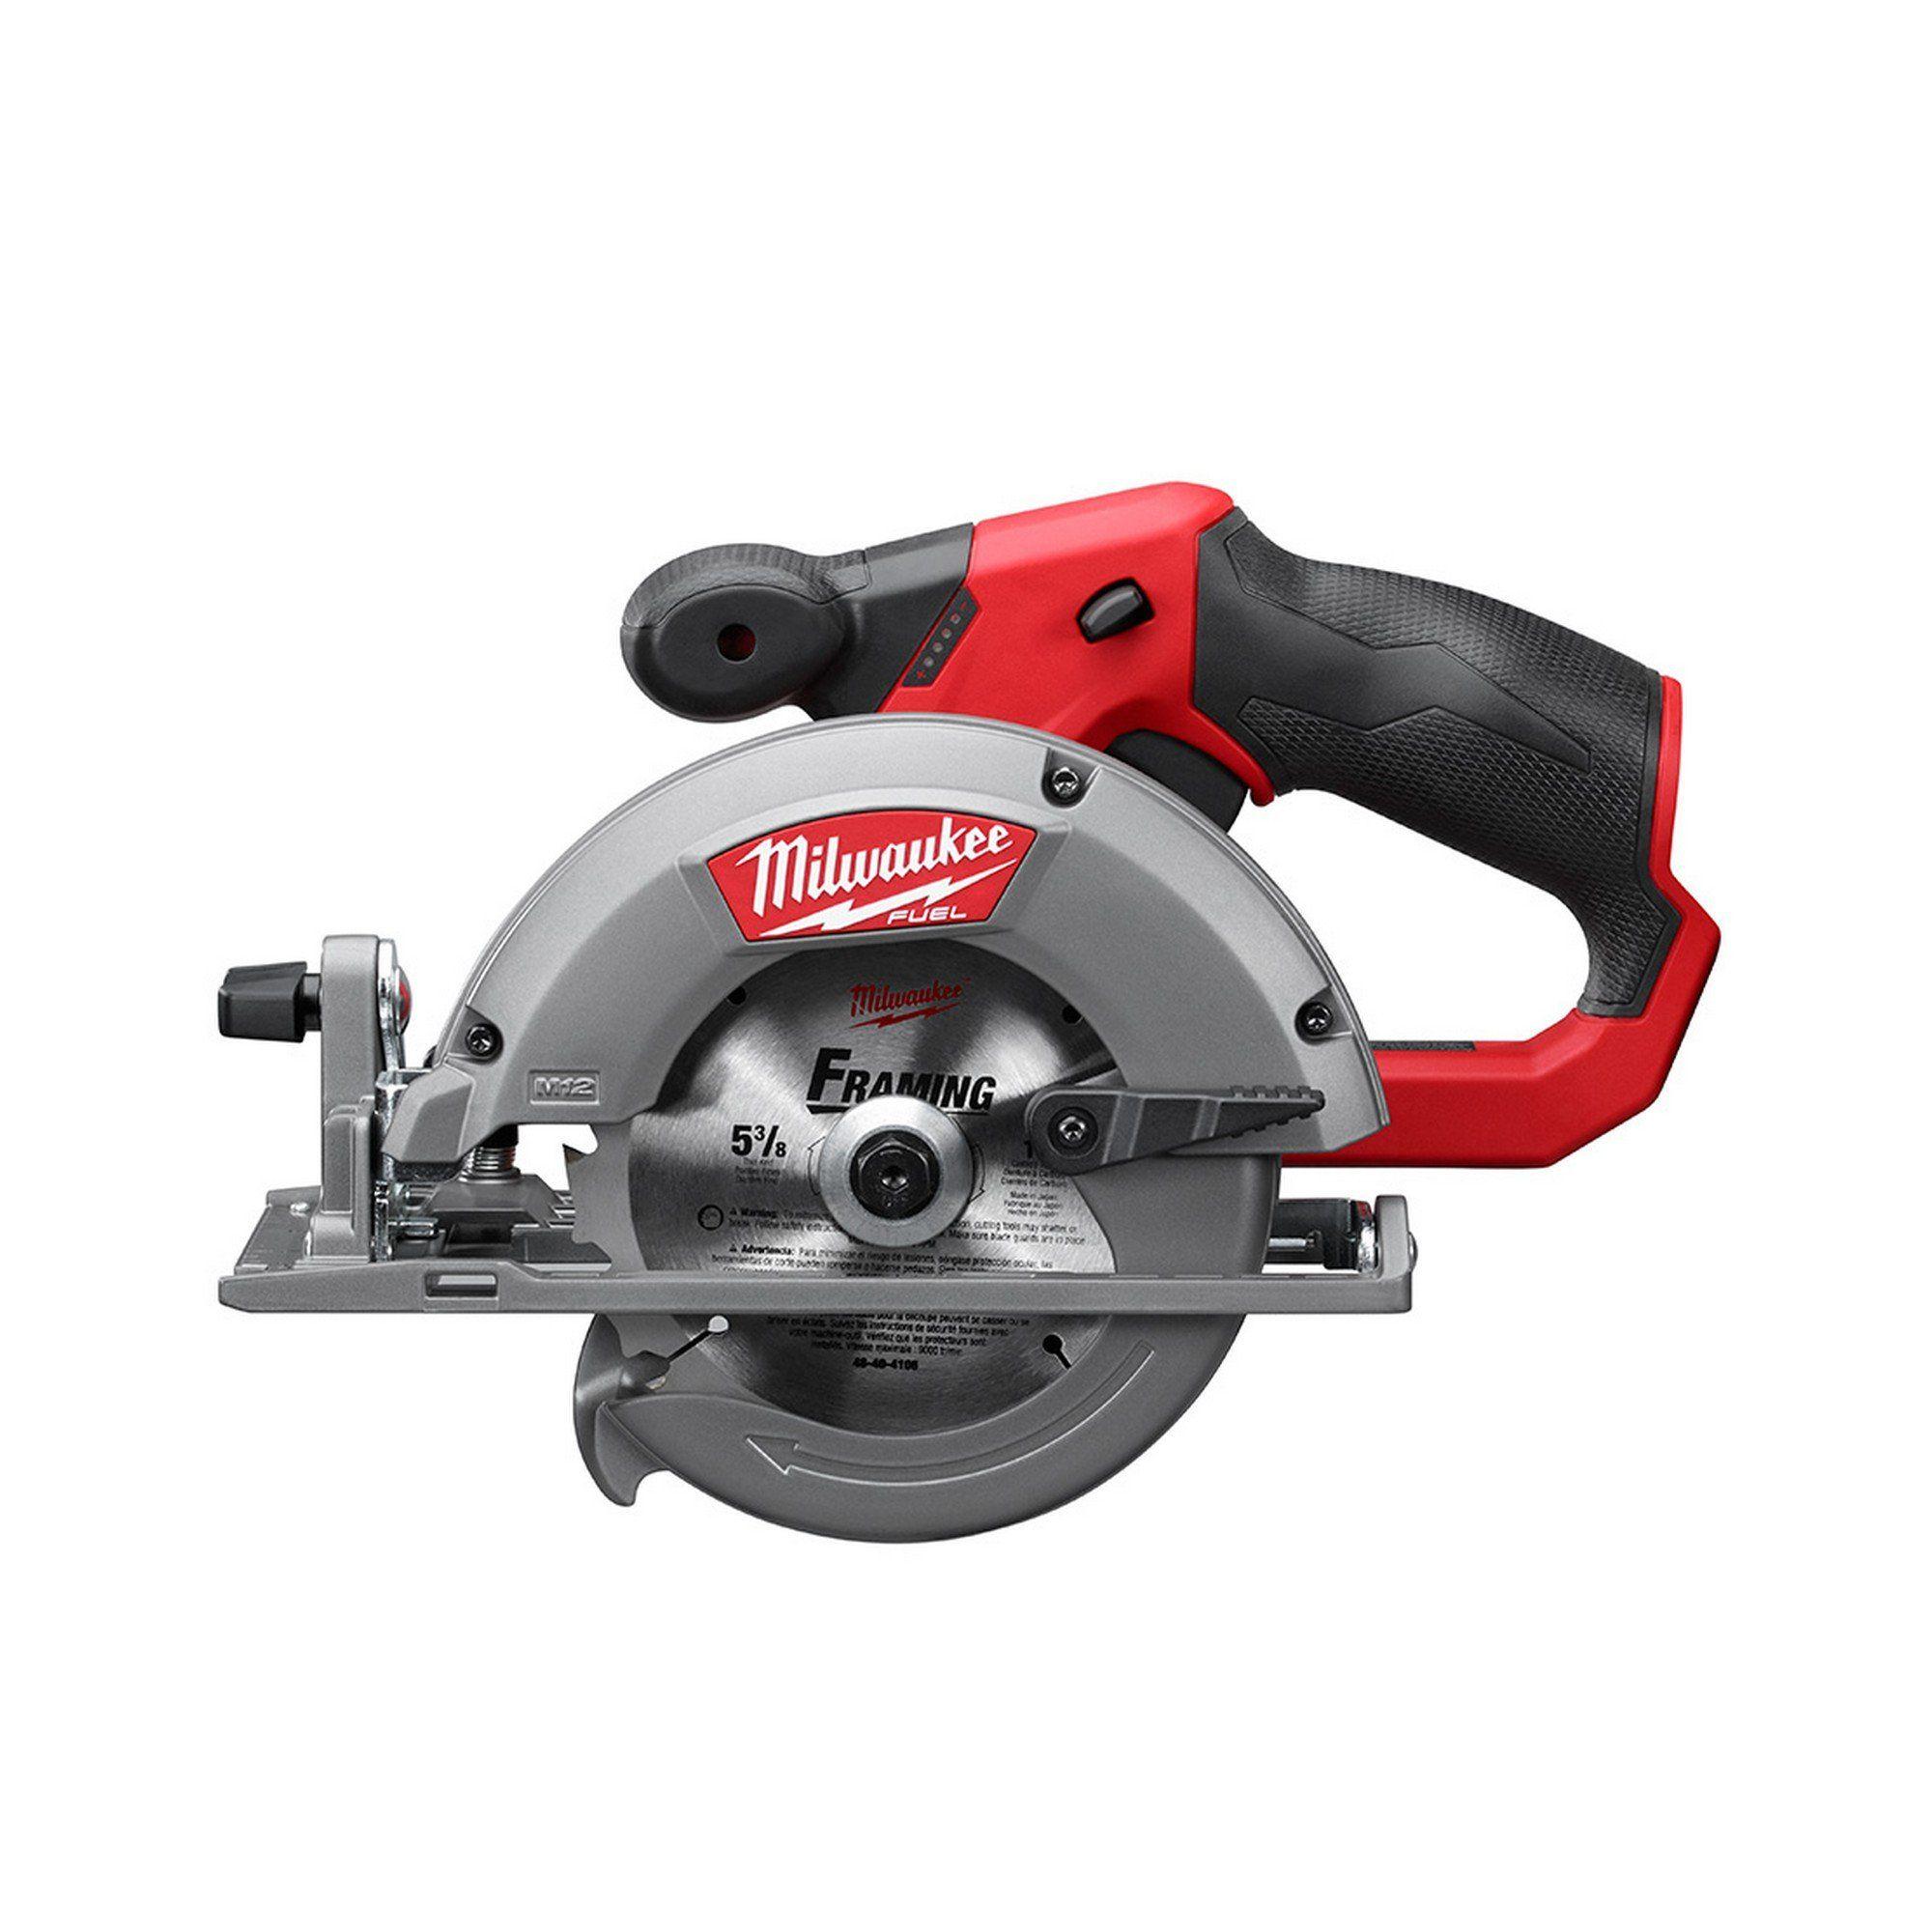 2530 20 Milwaukee M12 Fuel 5 3 8 Circular Saw Tool Only Cordless Circular Saw Milwaukee Circular Saw Best Circular Saw